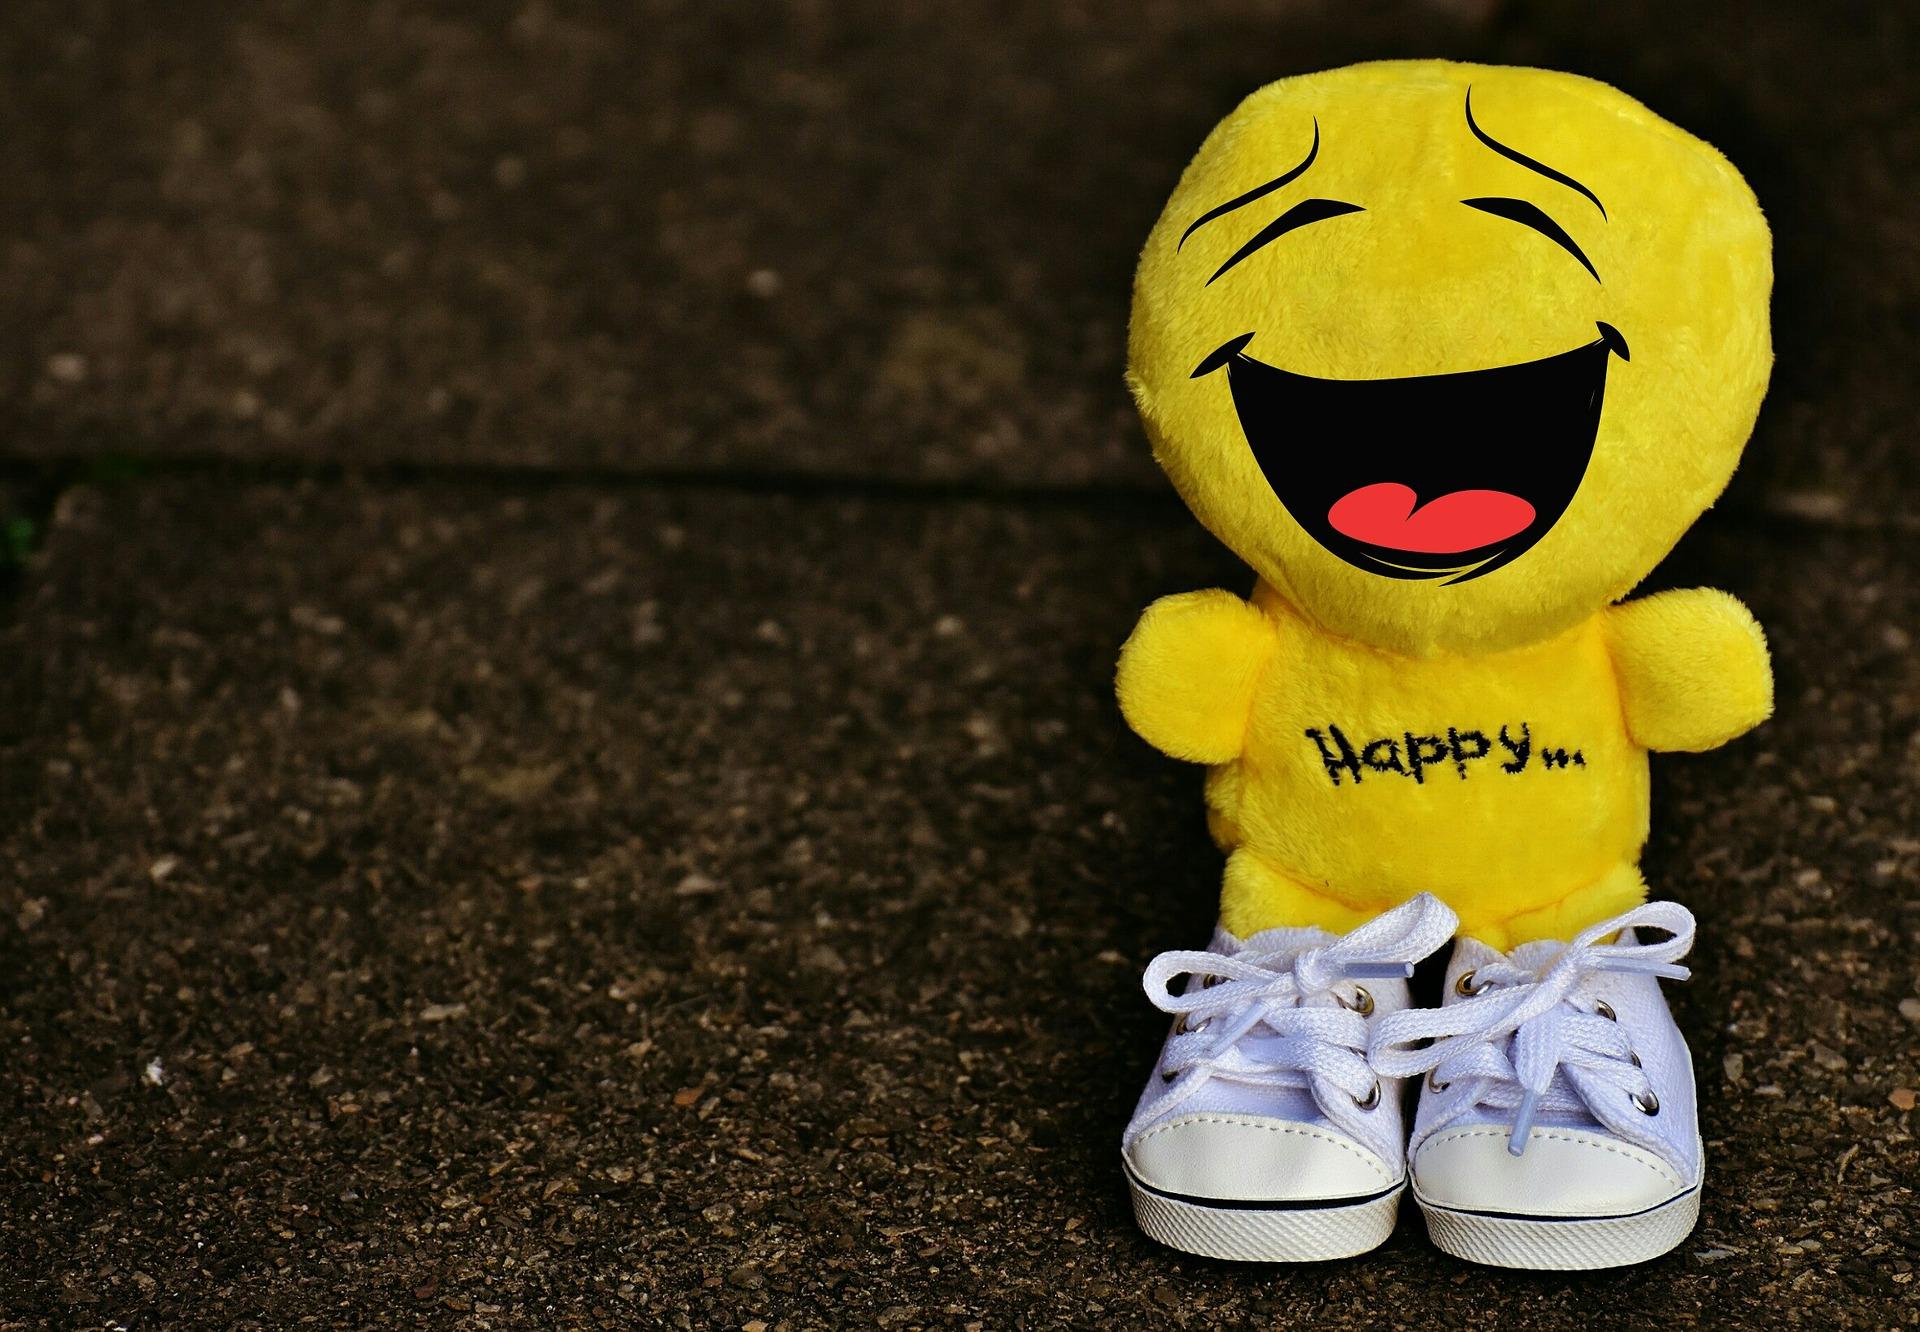 smiley-1876329_1920.jpg